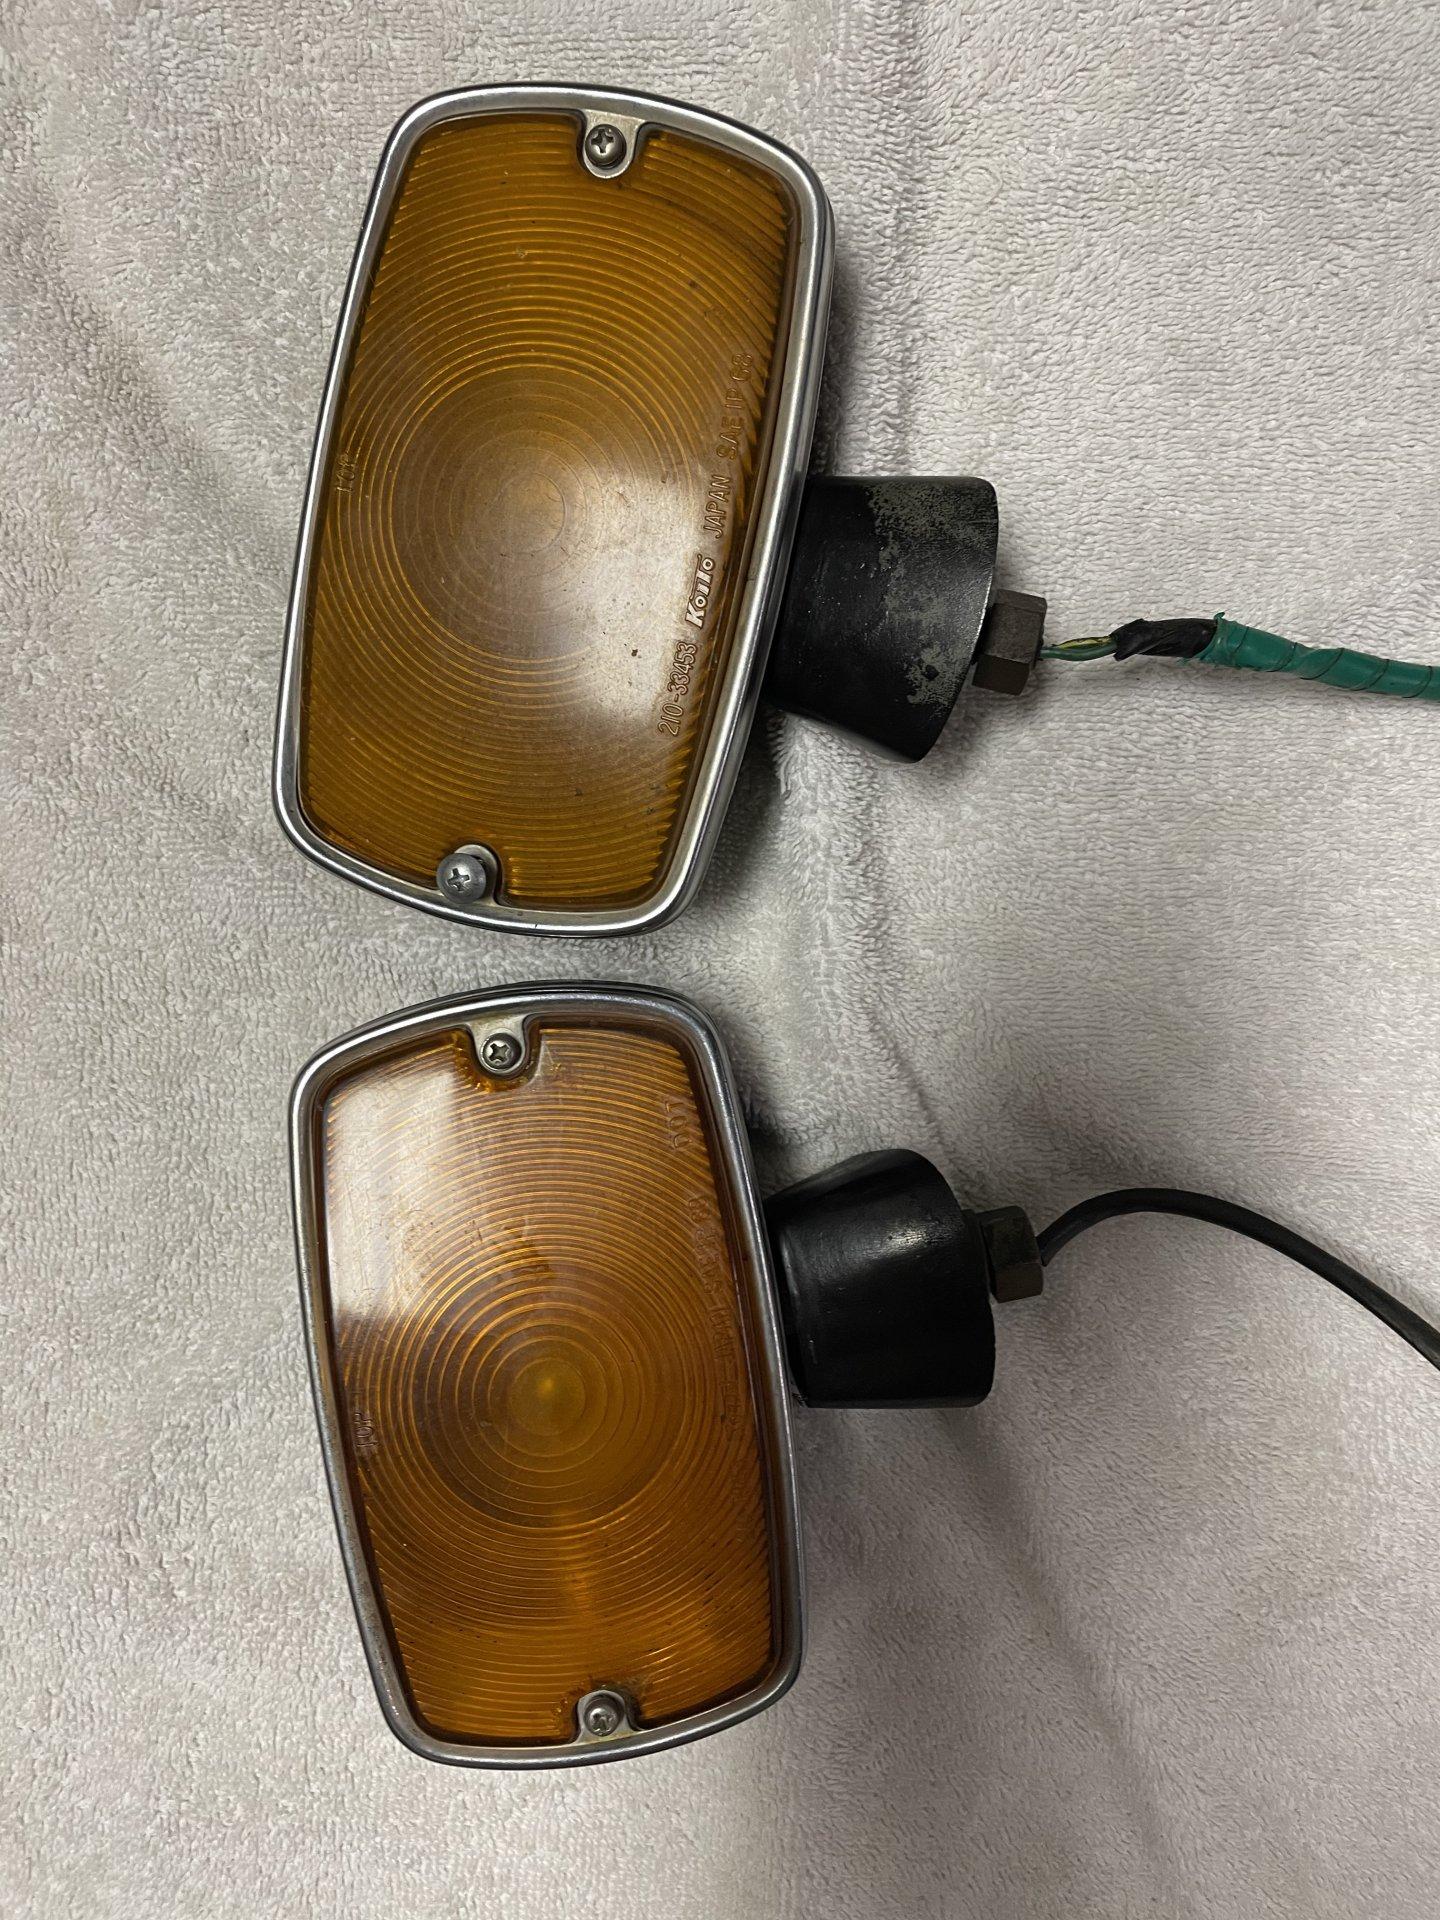 For Sale - 71 FJ40 front turn signals original ok shape ...